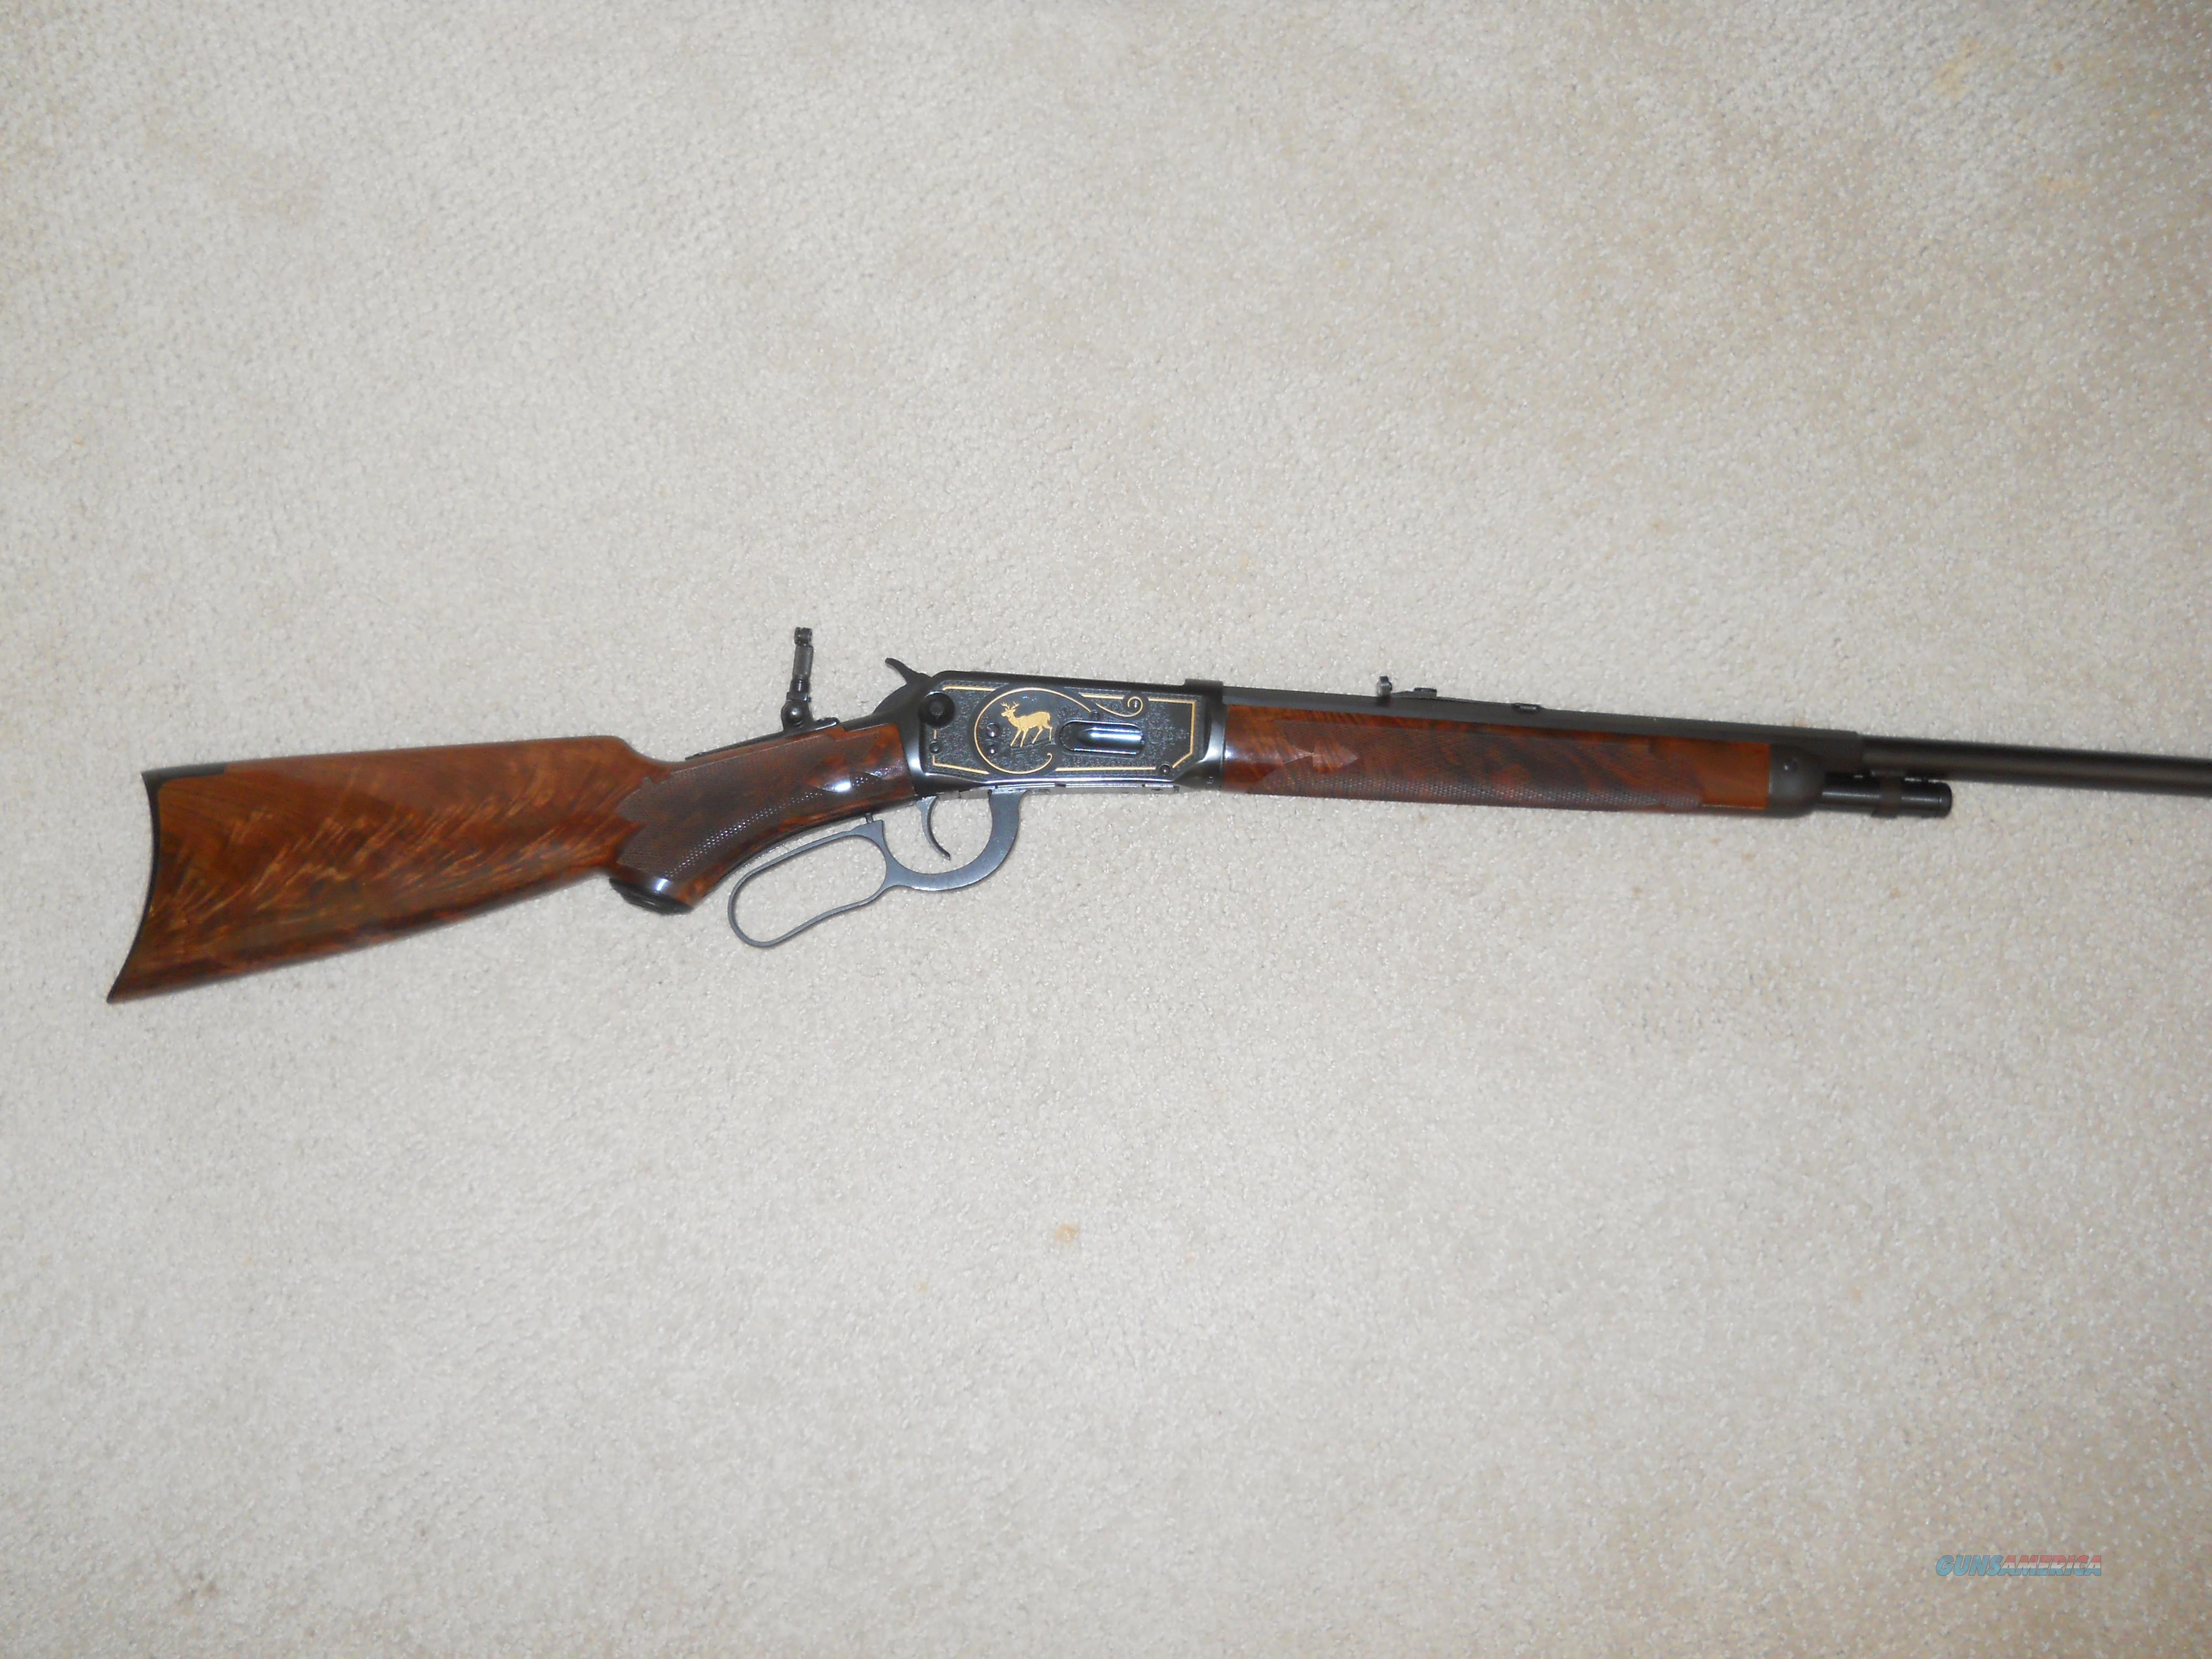 WINCHESTER Model 94 Limited Edition Centennial High Grade  Guns > Rifles > Winchester Rifle Commemoratives